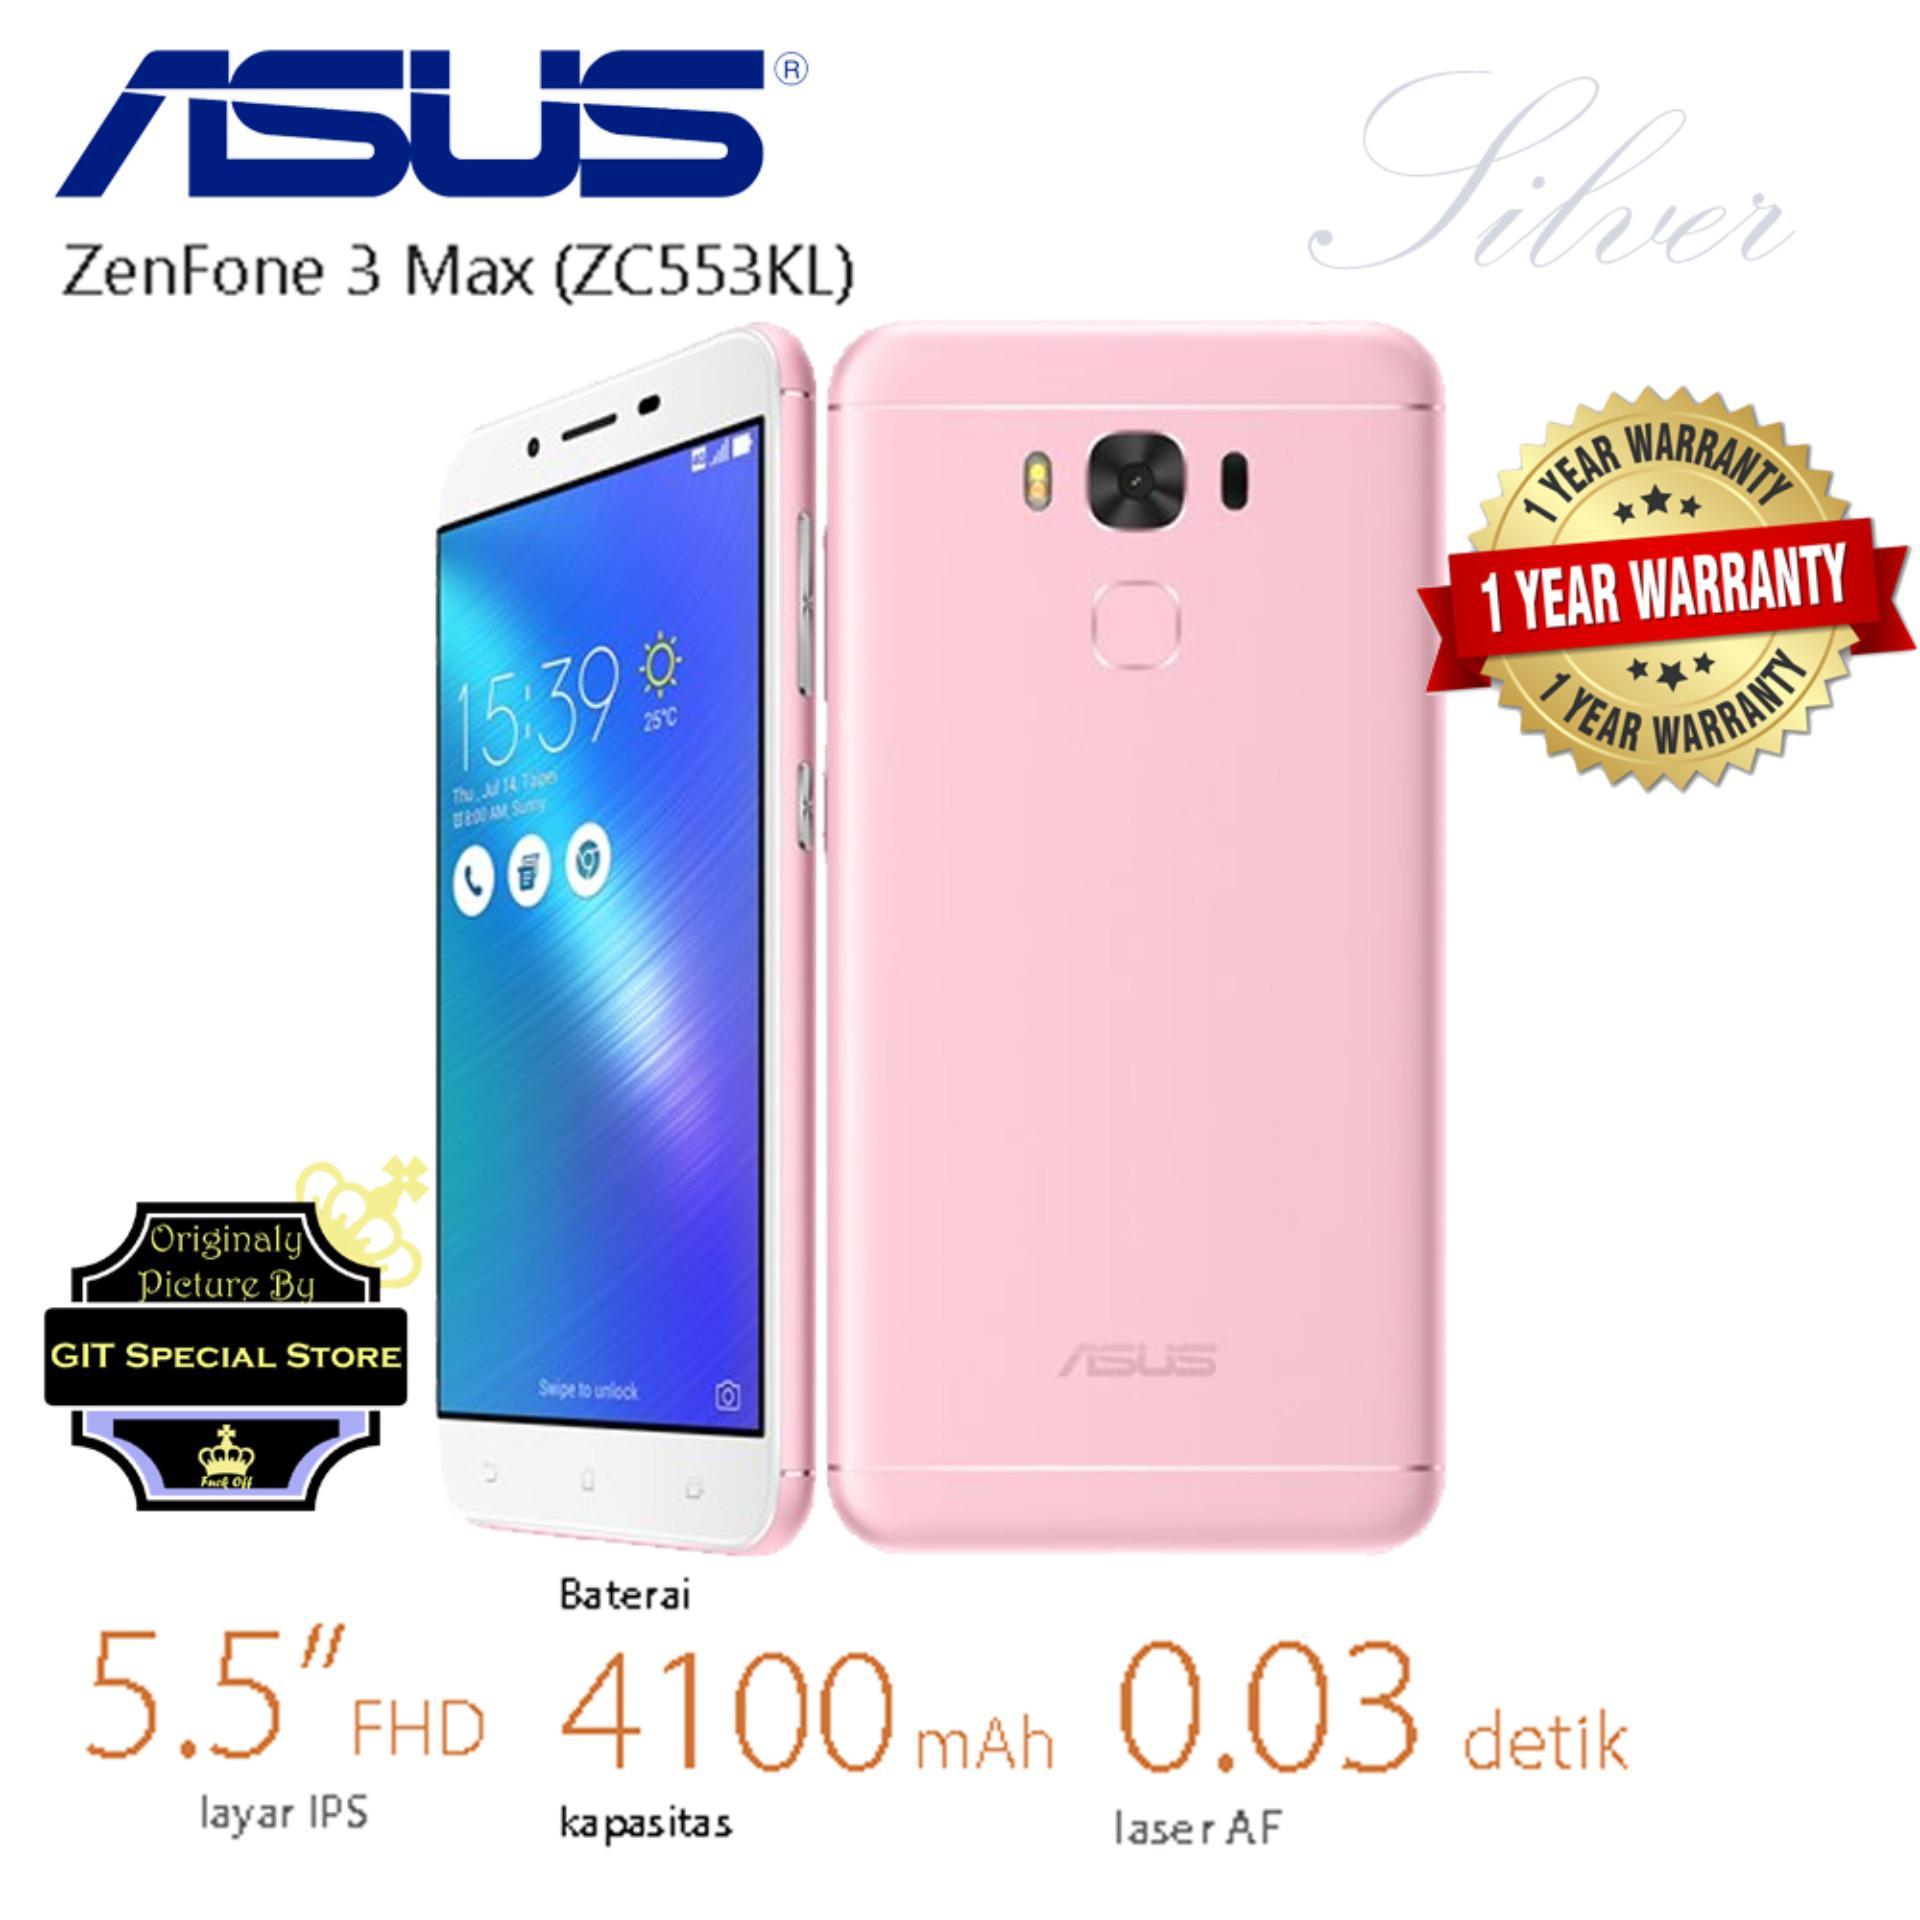 Harga Diskon Asus Zenfone 4 Selfi 64gb Zd553kl Black 3 Laser Zc551kl Garansi Resmi Mode Max Zc553kl 32gb Pink 55 Inches Dual Simcard